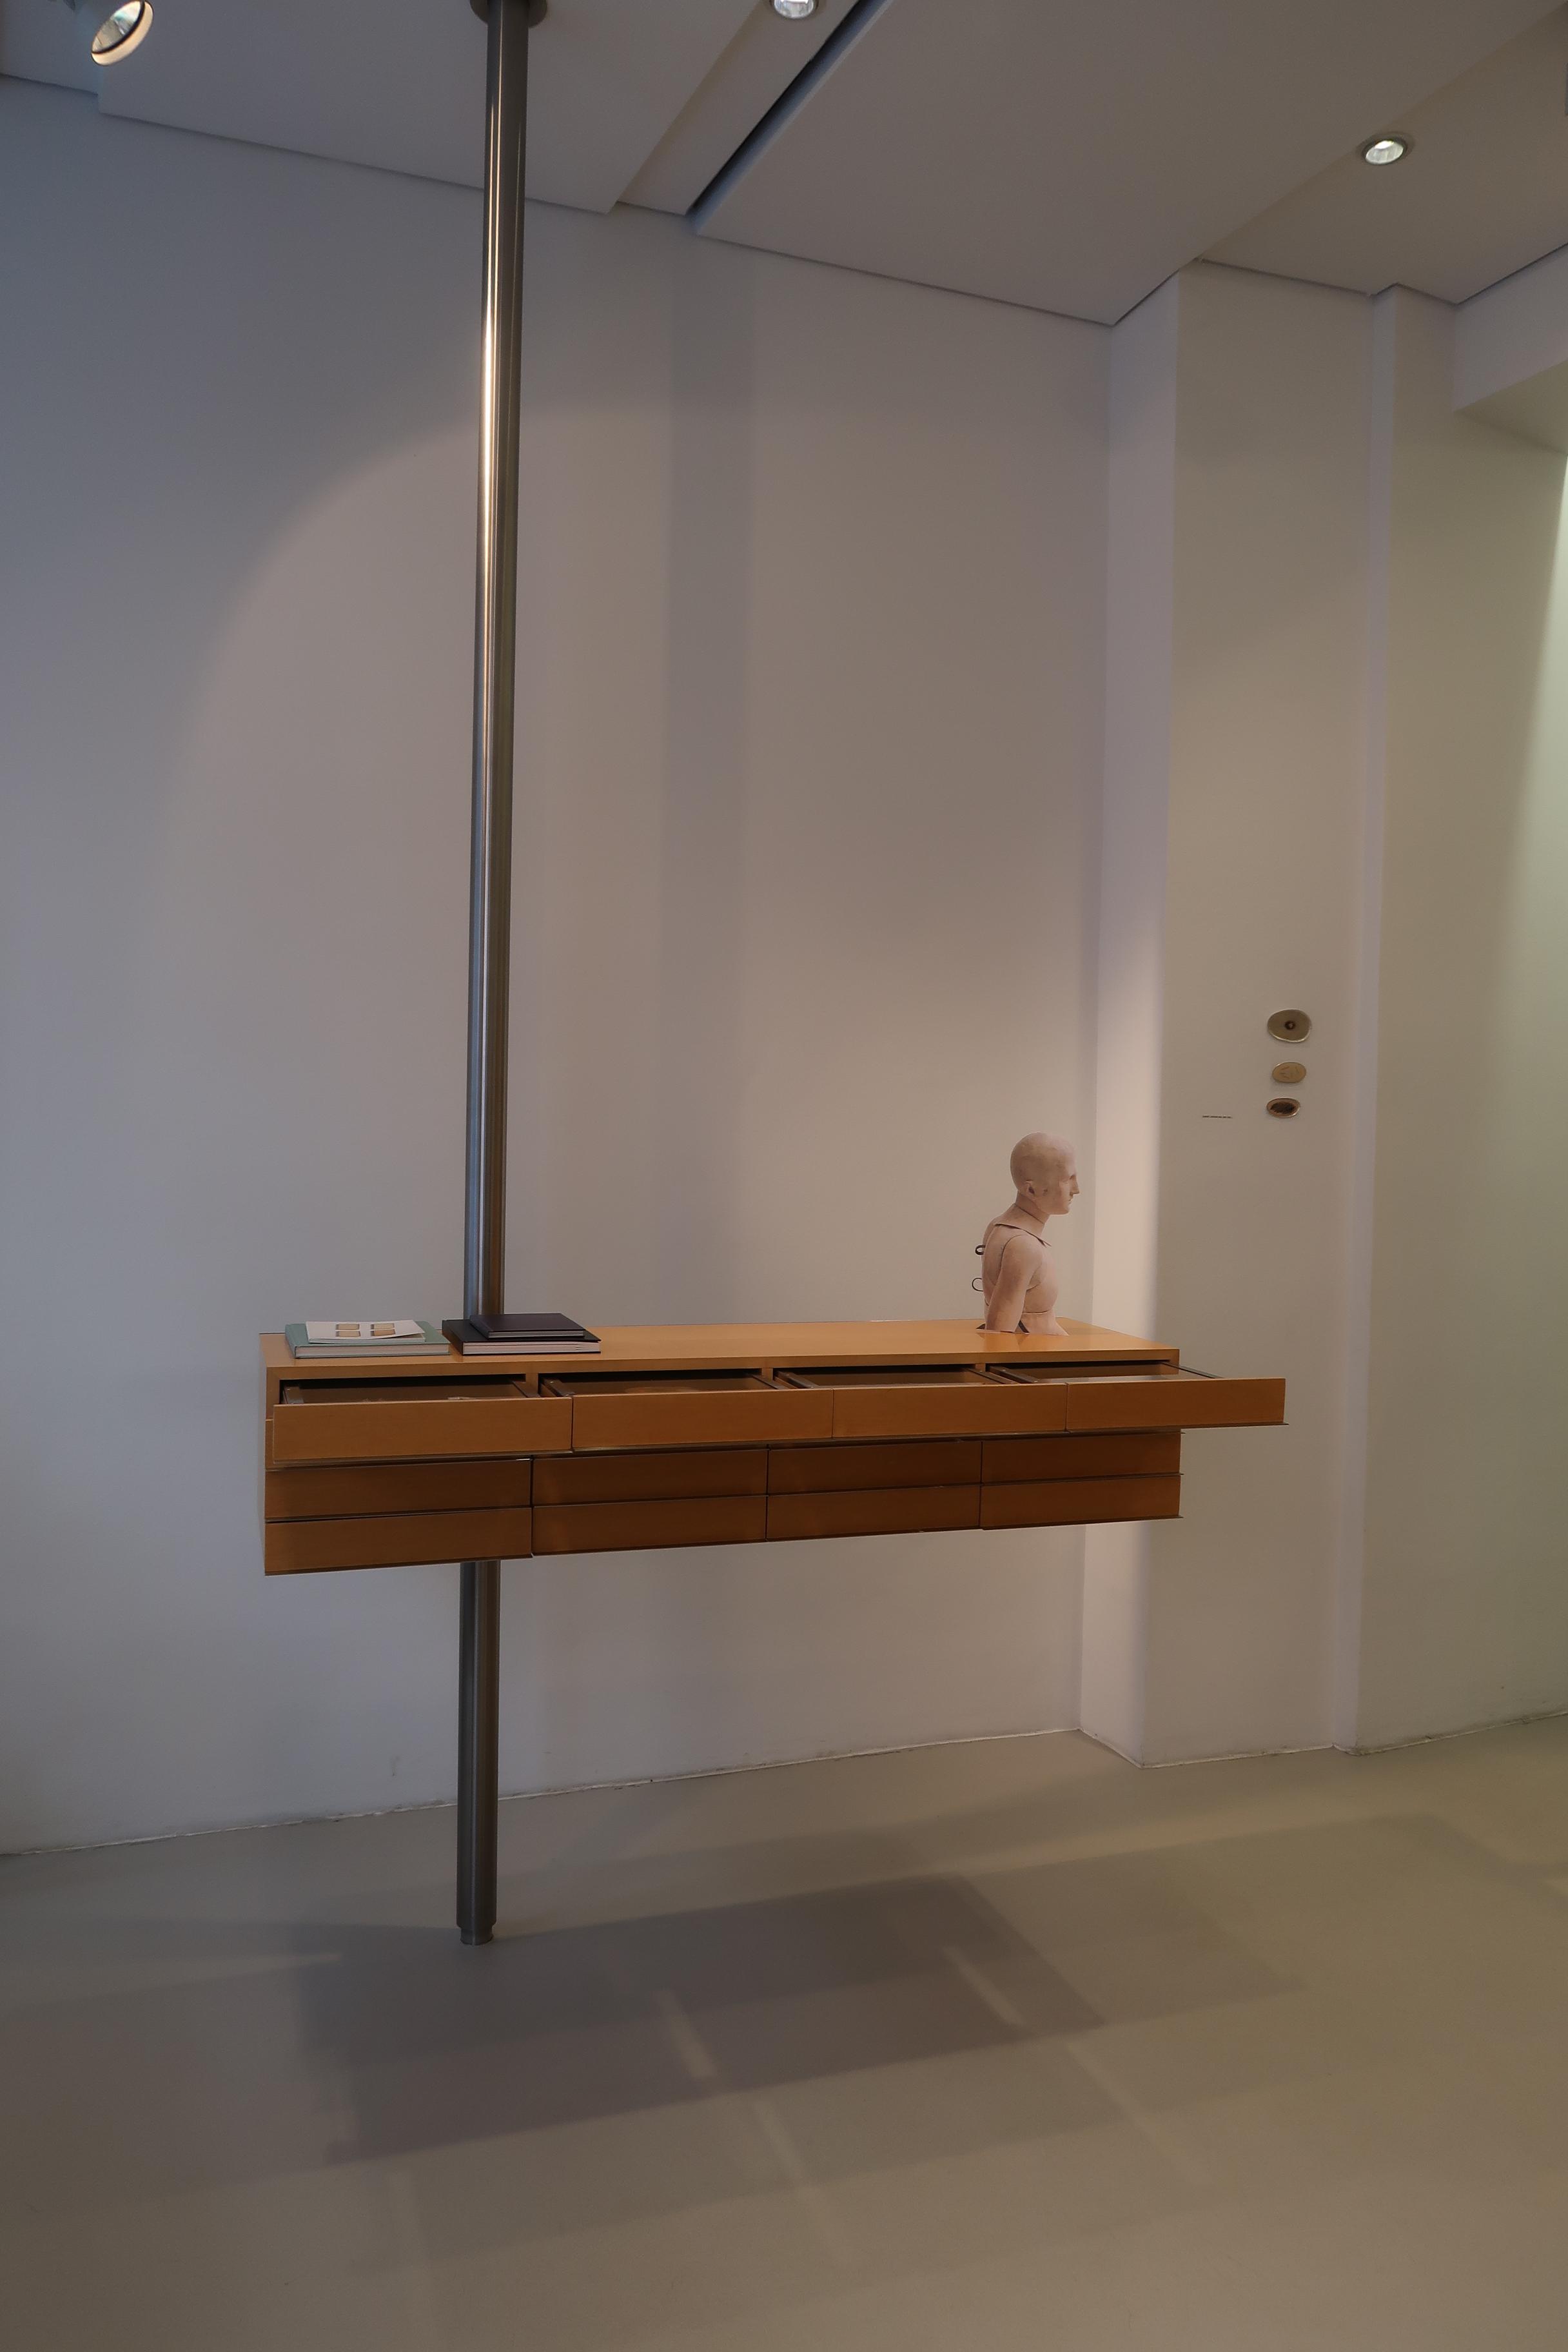 Galerie Isabella Hund, interieur, München, 12 maart 2020. Foto Coert Peter Krabbe, CC BY 4.0, ladenkast